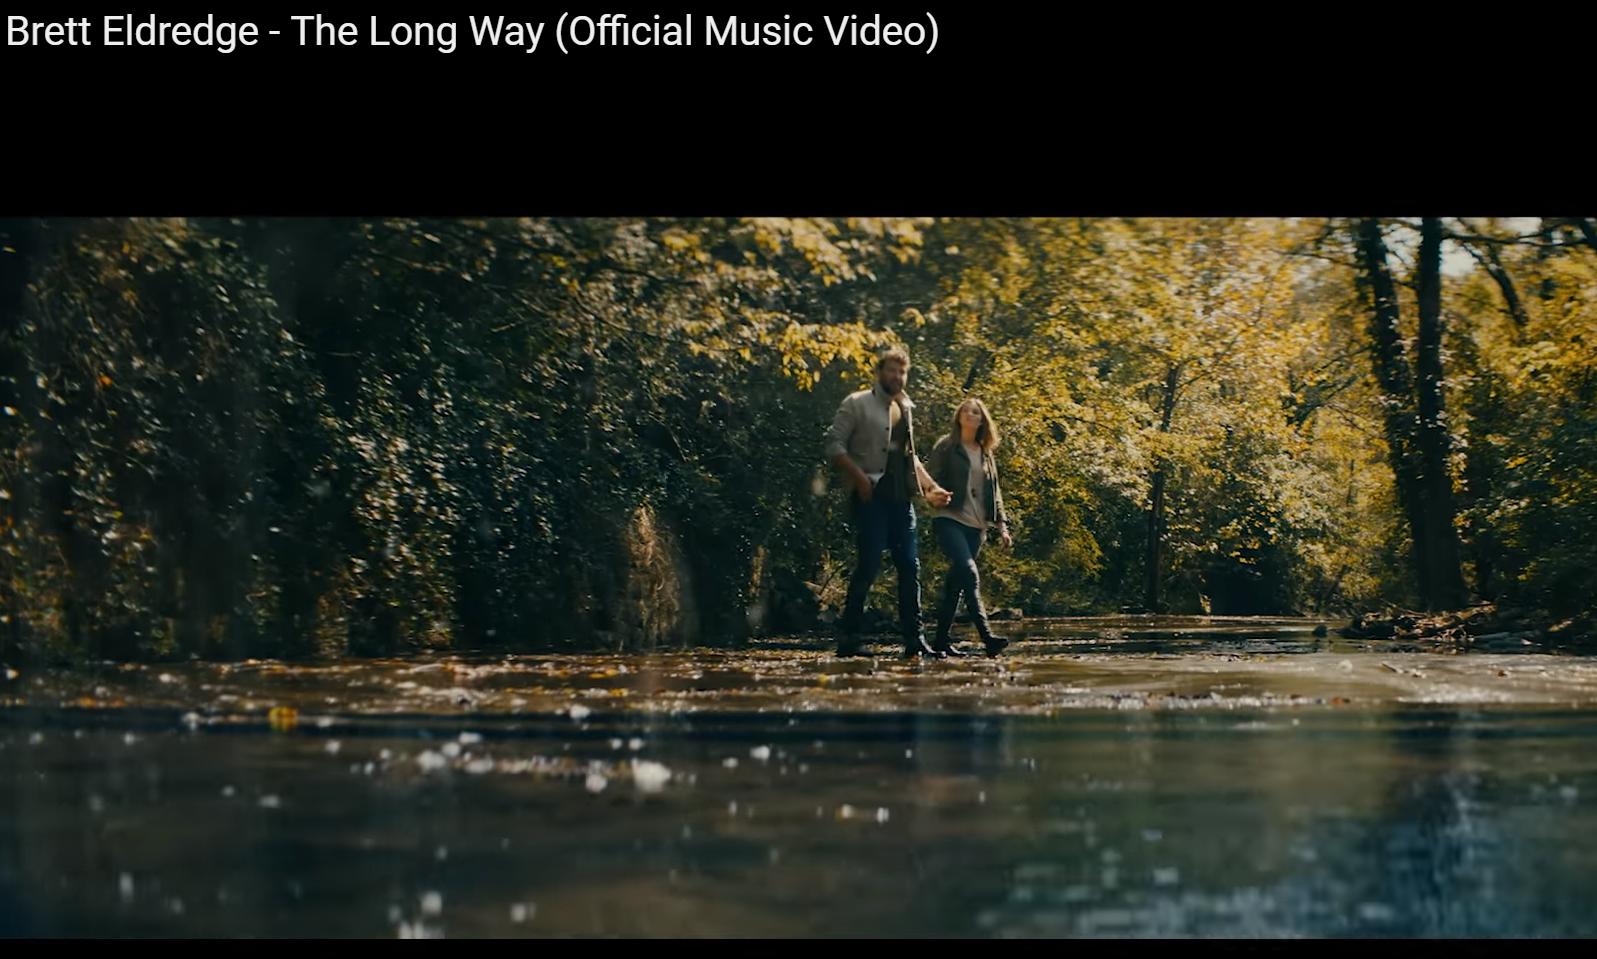 Brett Eldredge - The Long Way | Rudi's Blog